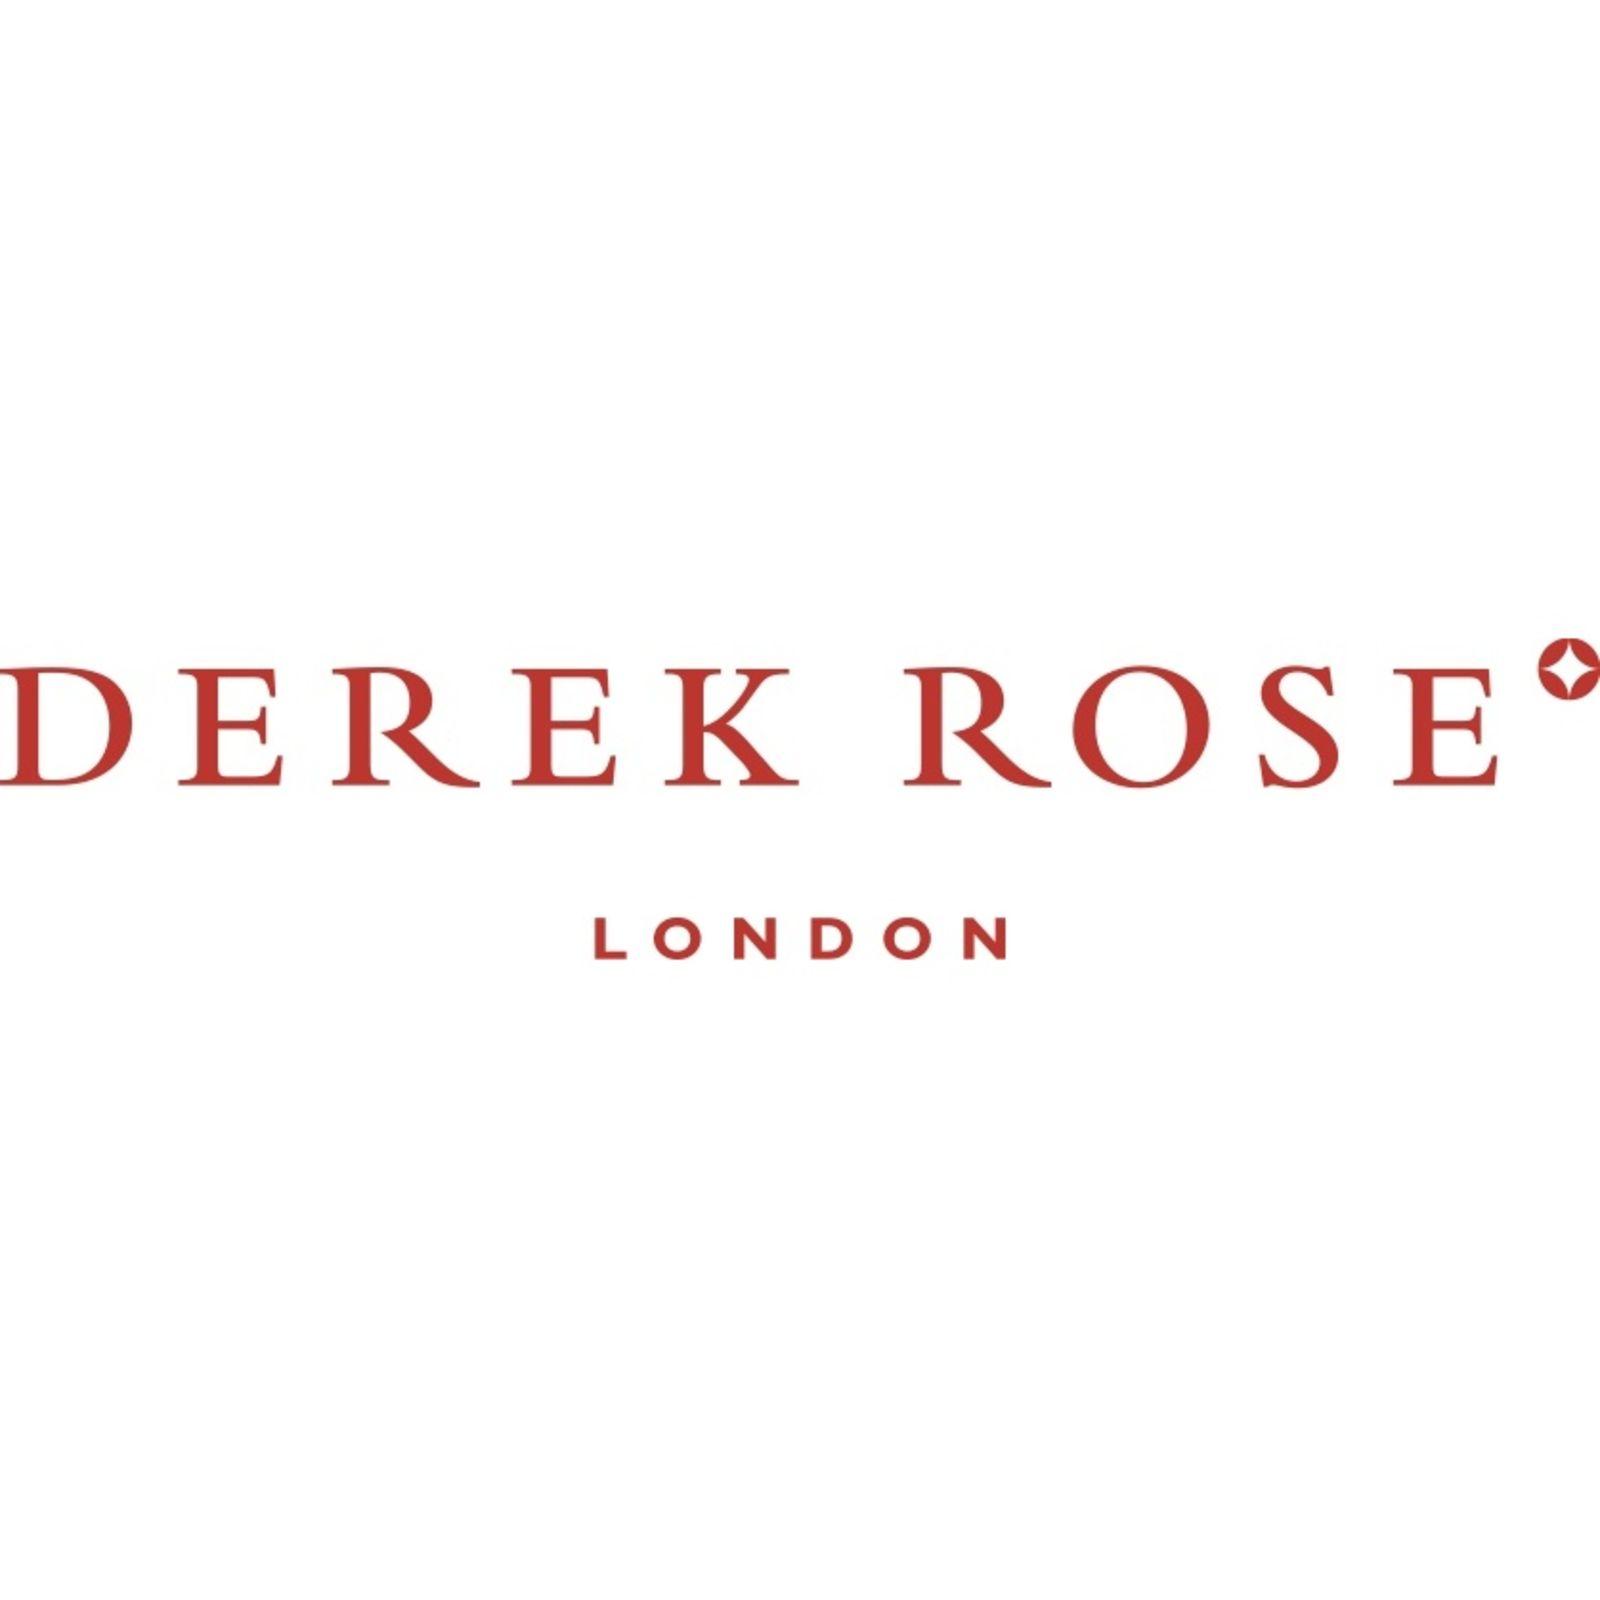 DEREK ROSE